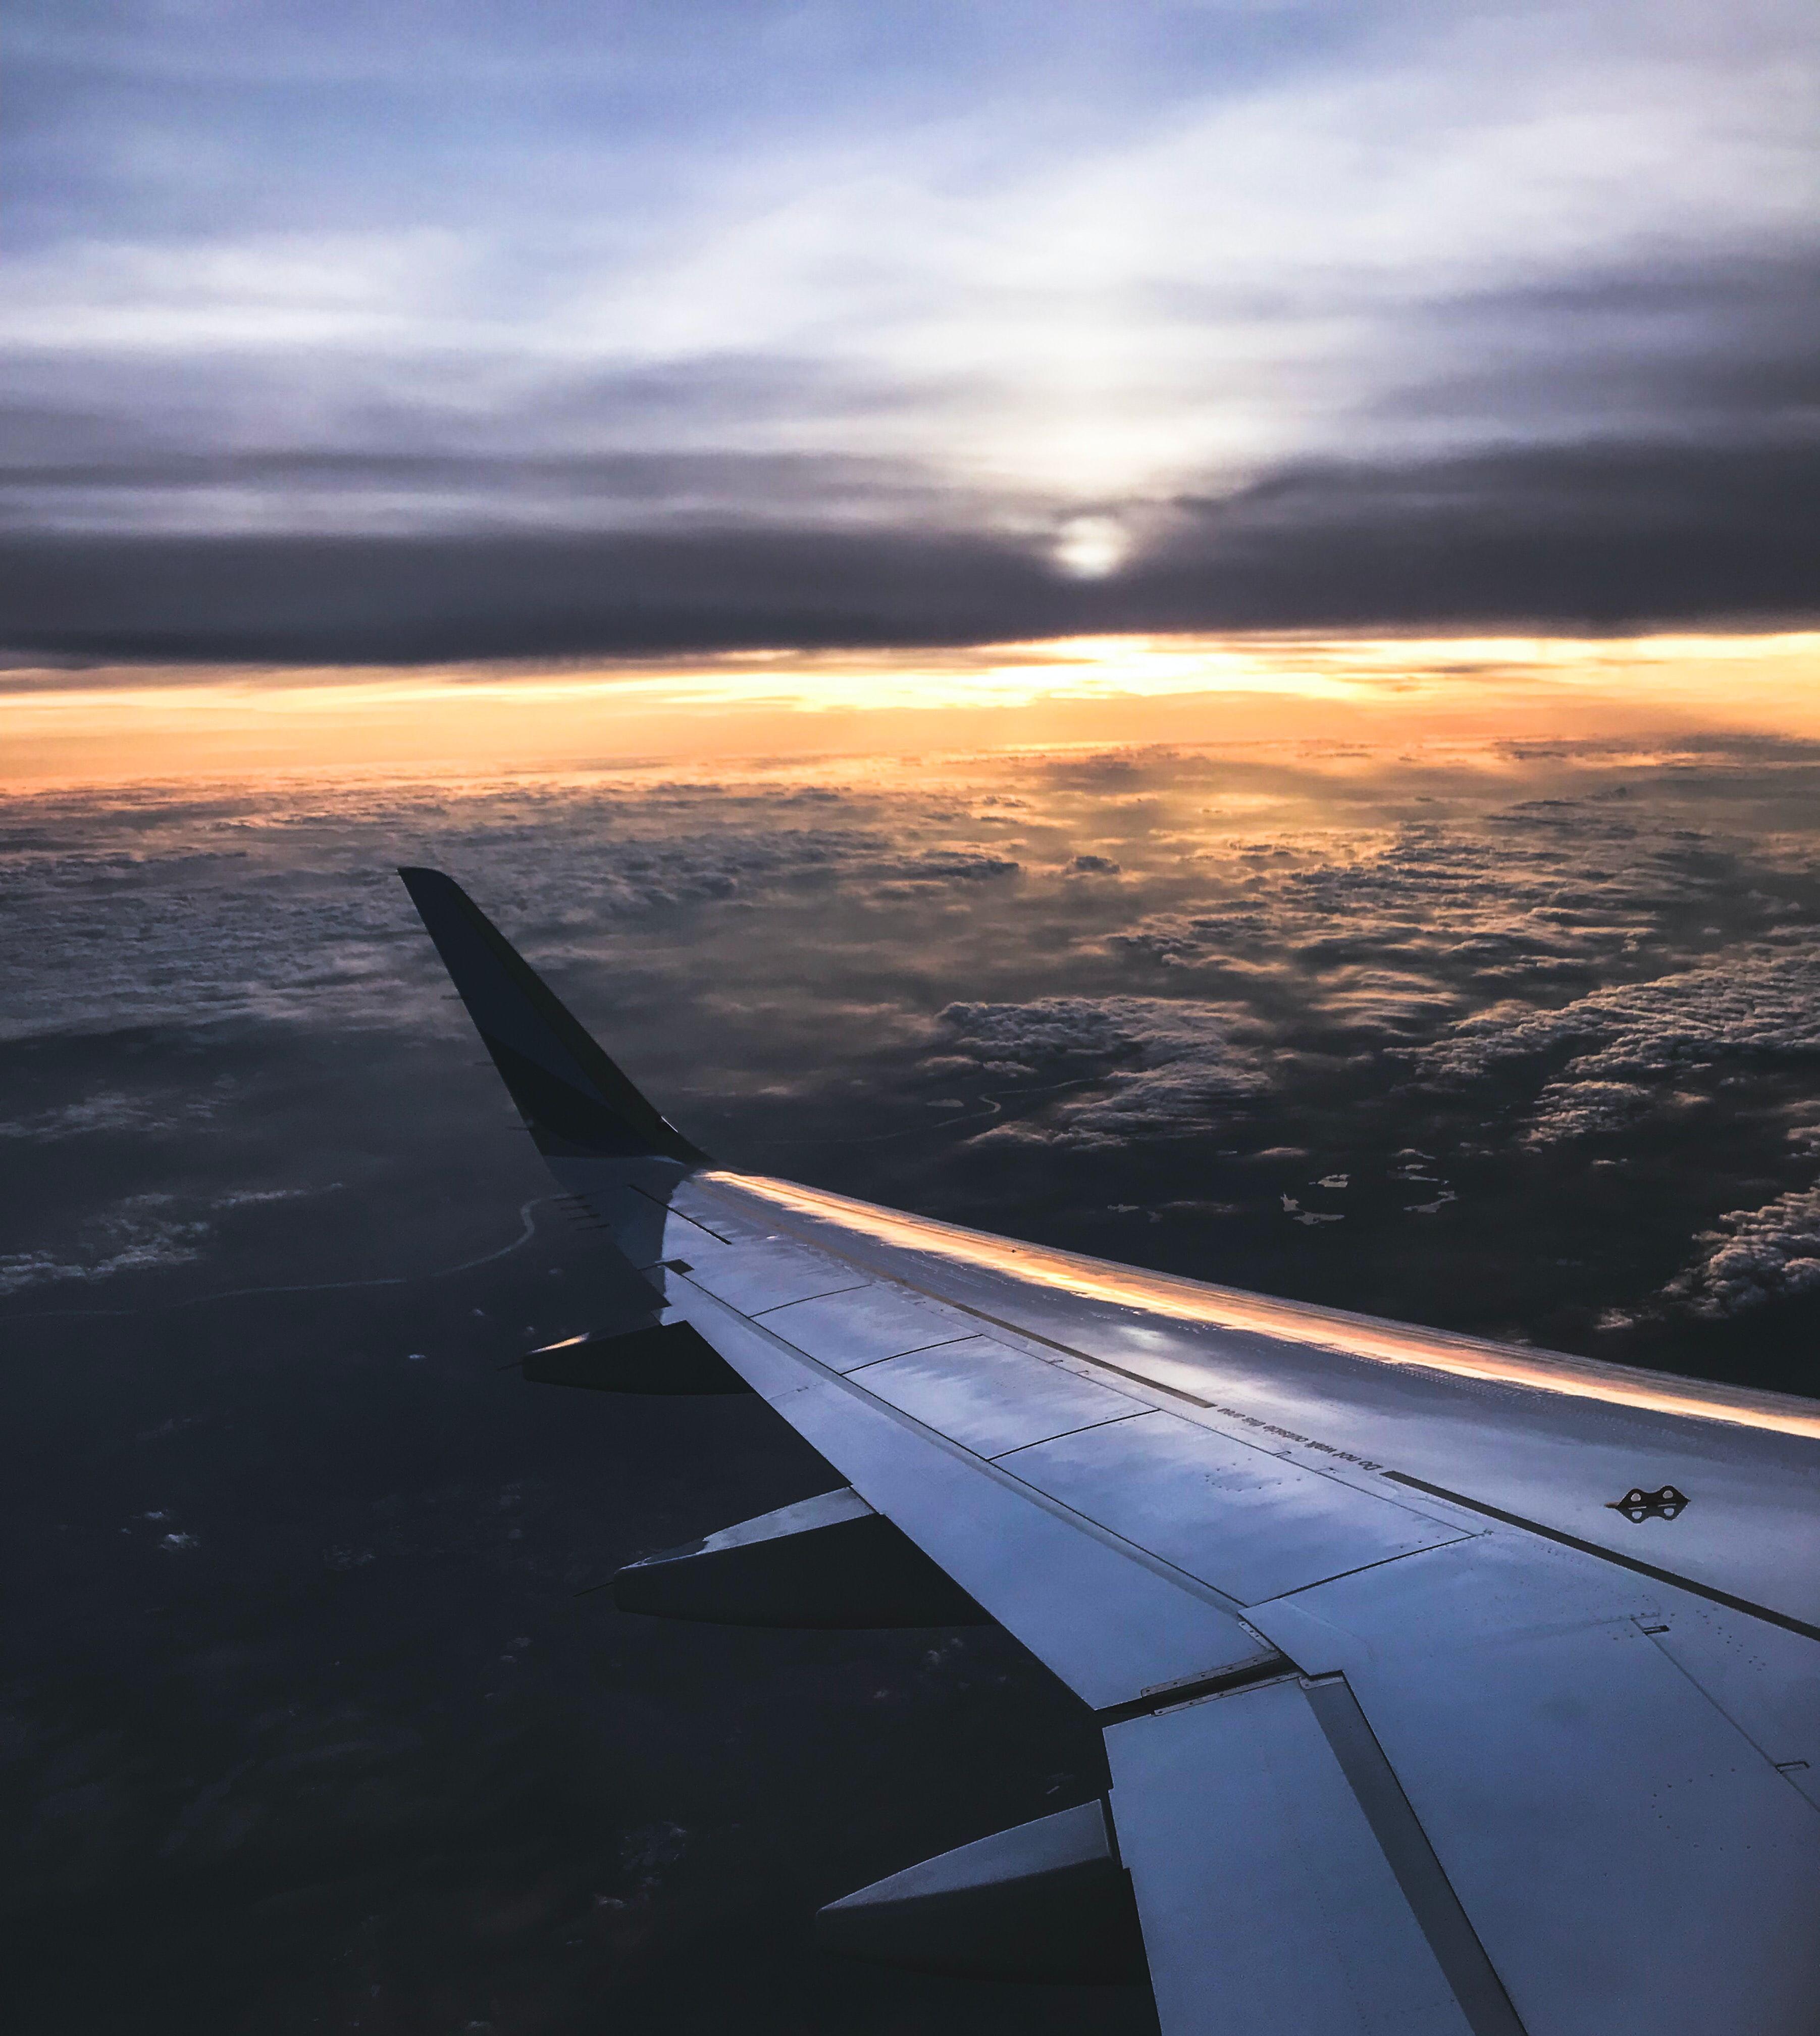 Man Urinates on Building, Plane Passenger Wakes up Wet